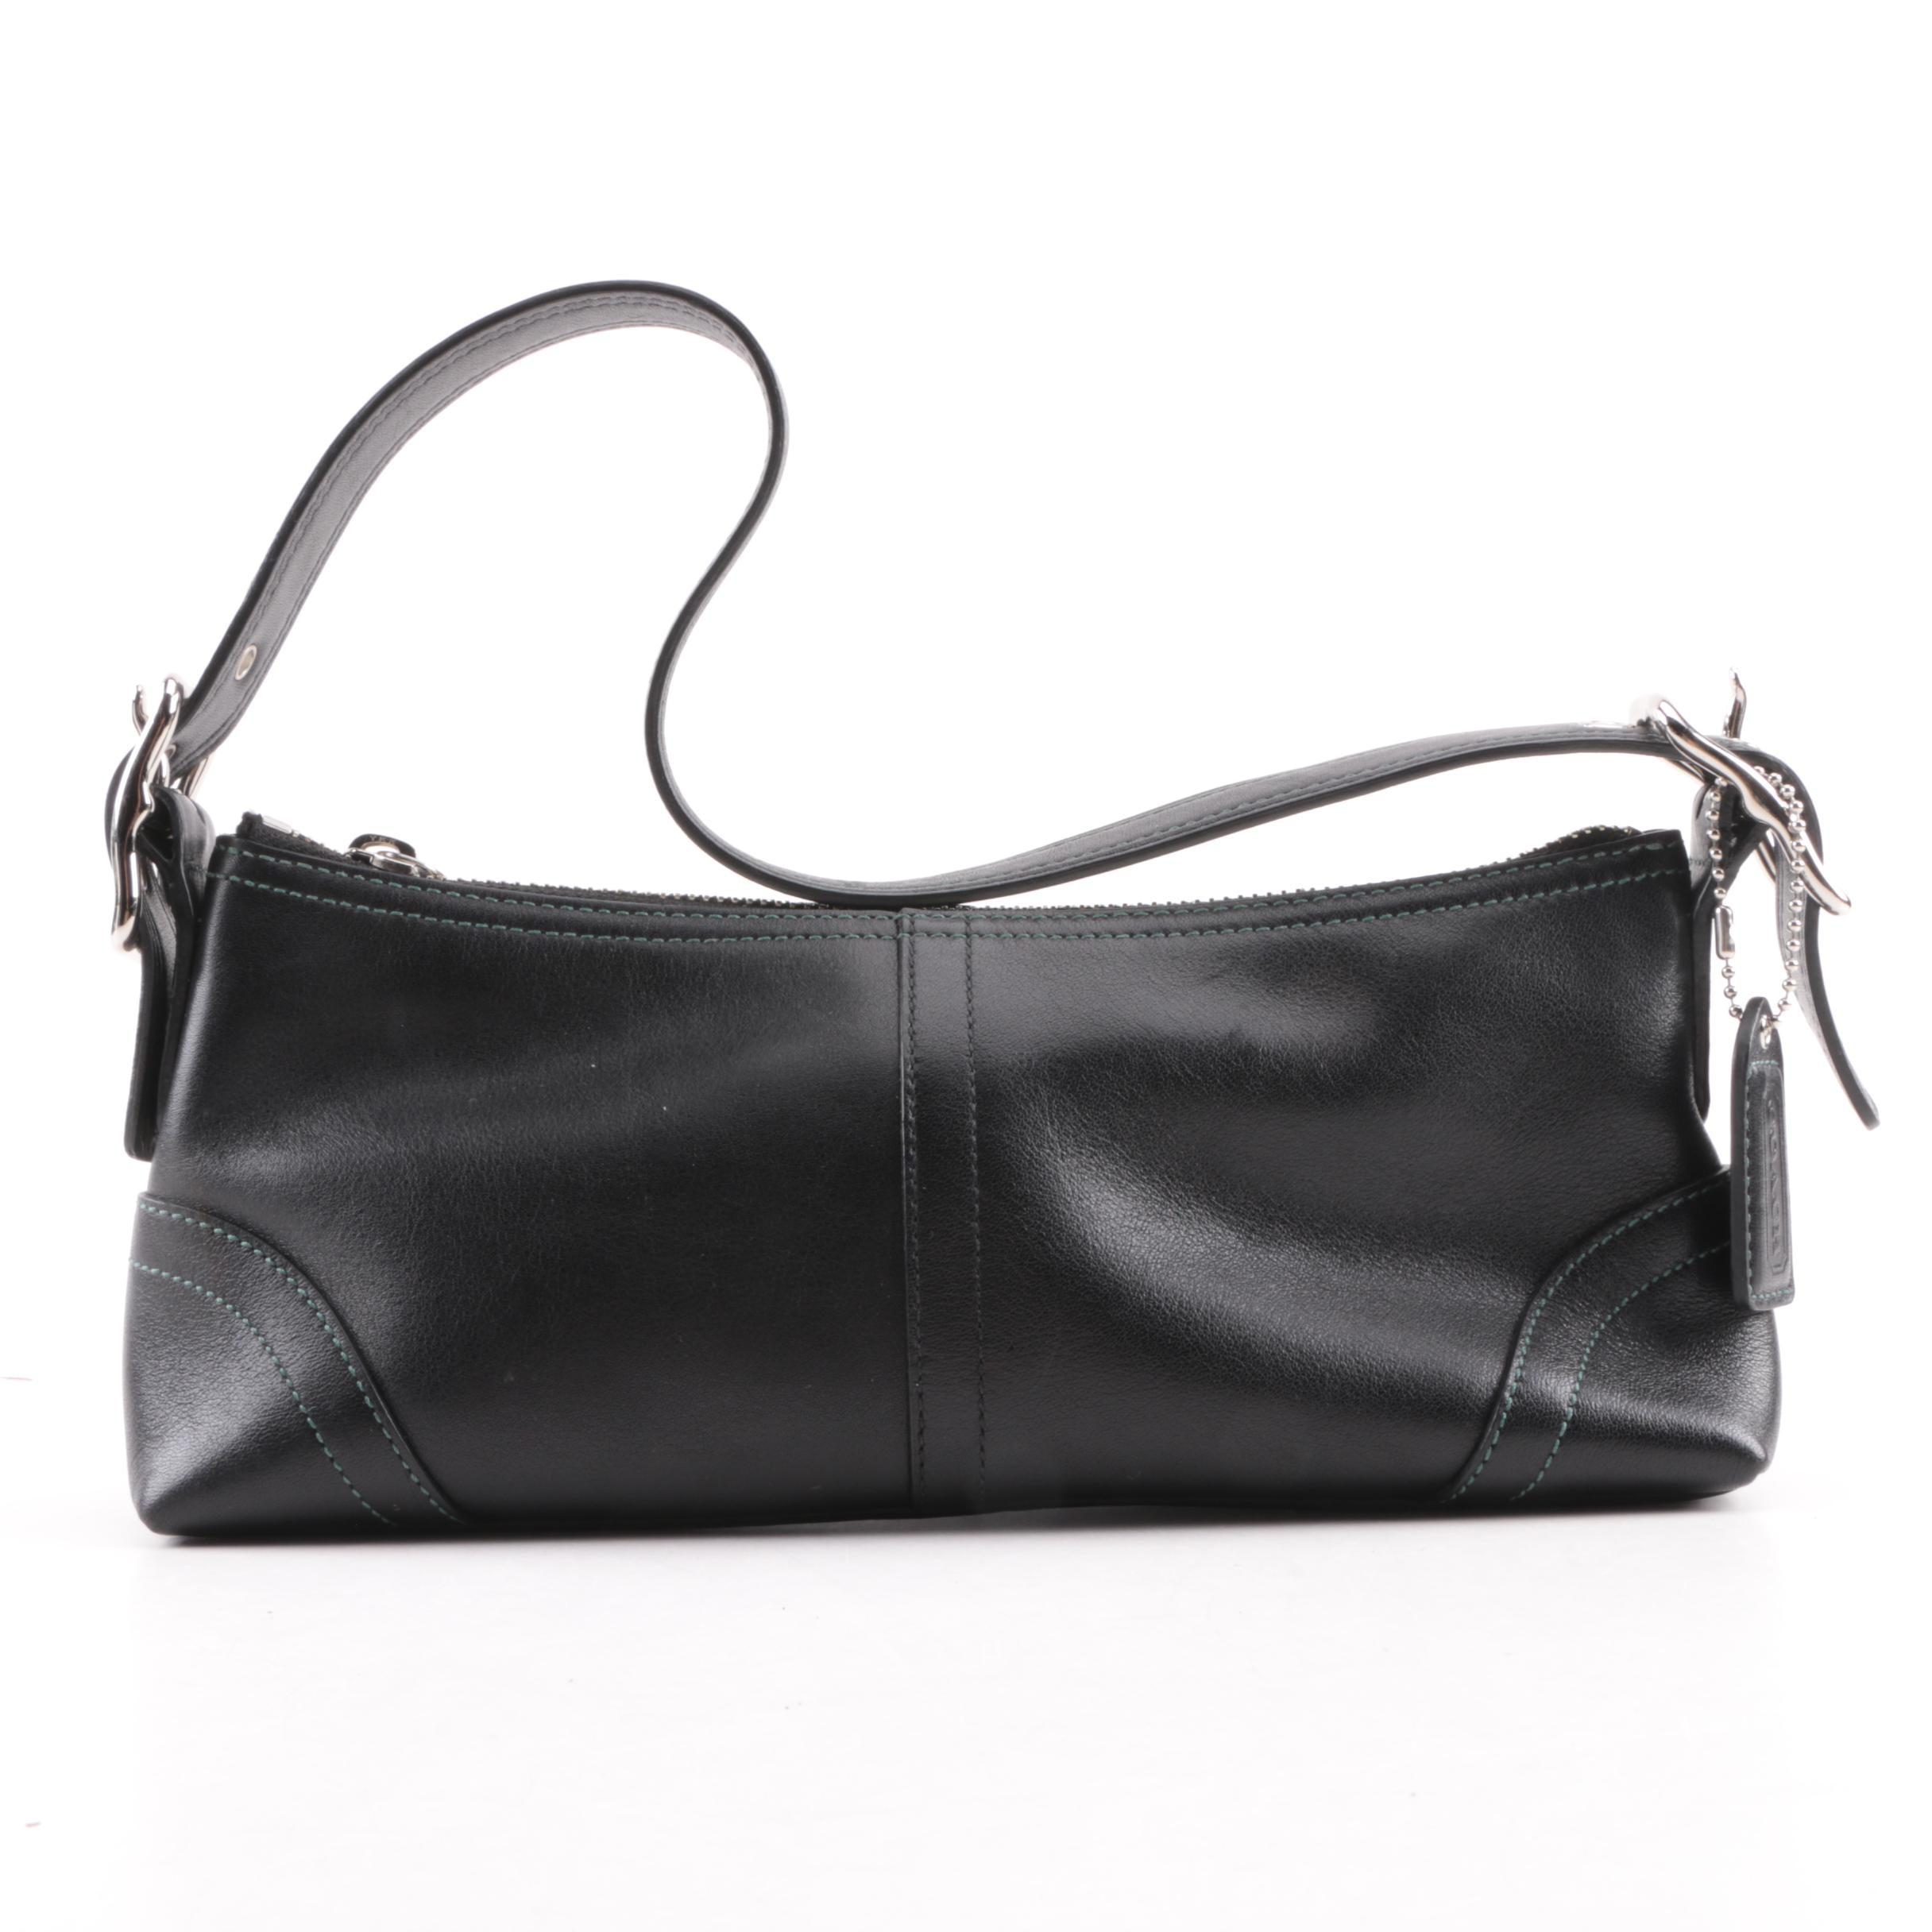 Coach East West Hampton Black Leather Demi Handbag